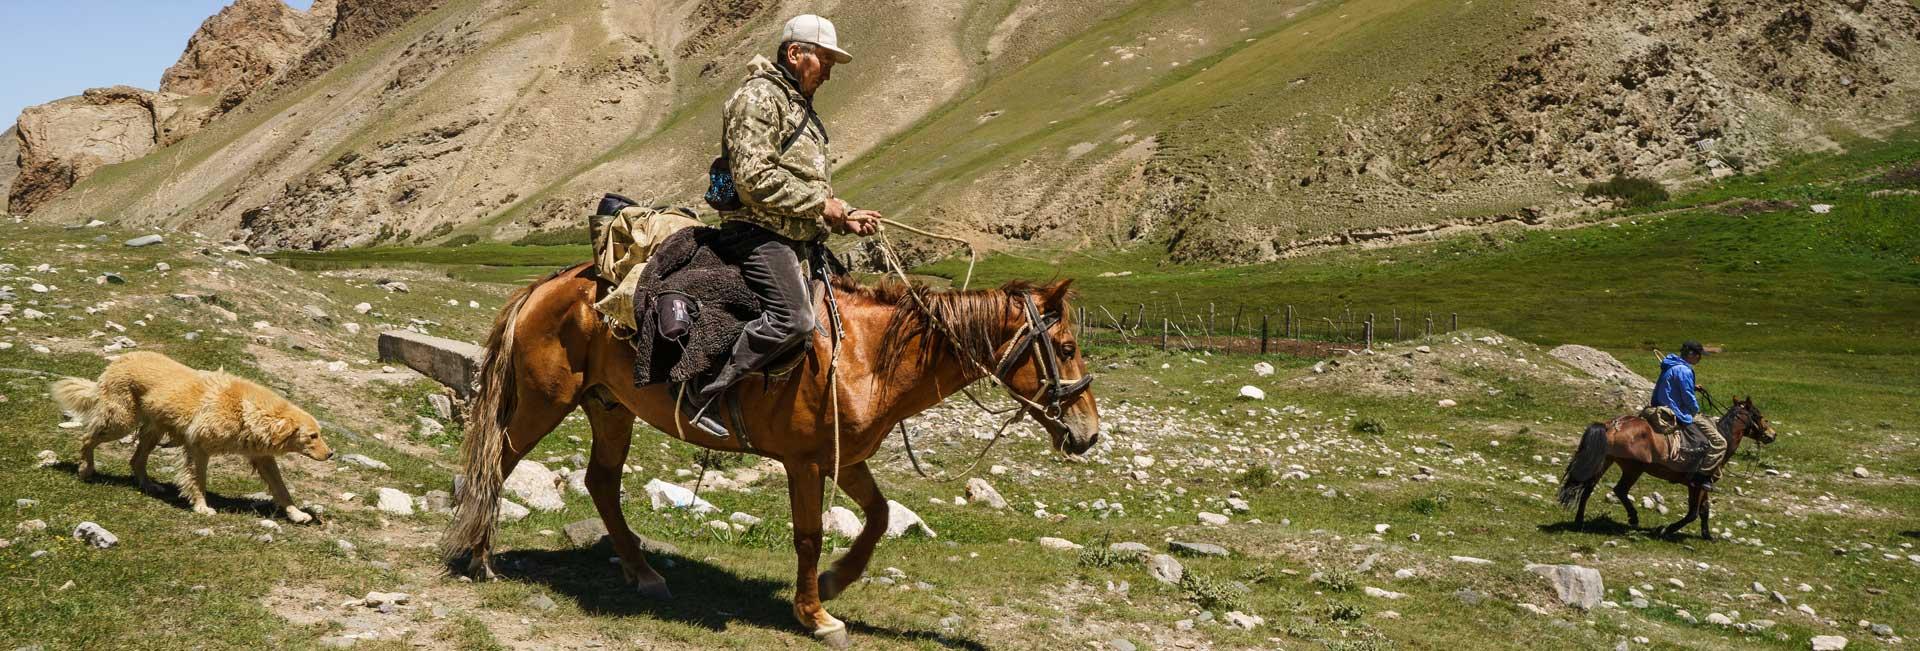 A shepherd in Tash Rabat, Kyrgyzstan. Photo credit: Jered Gorman